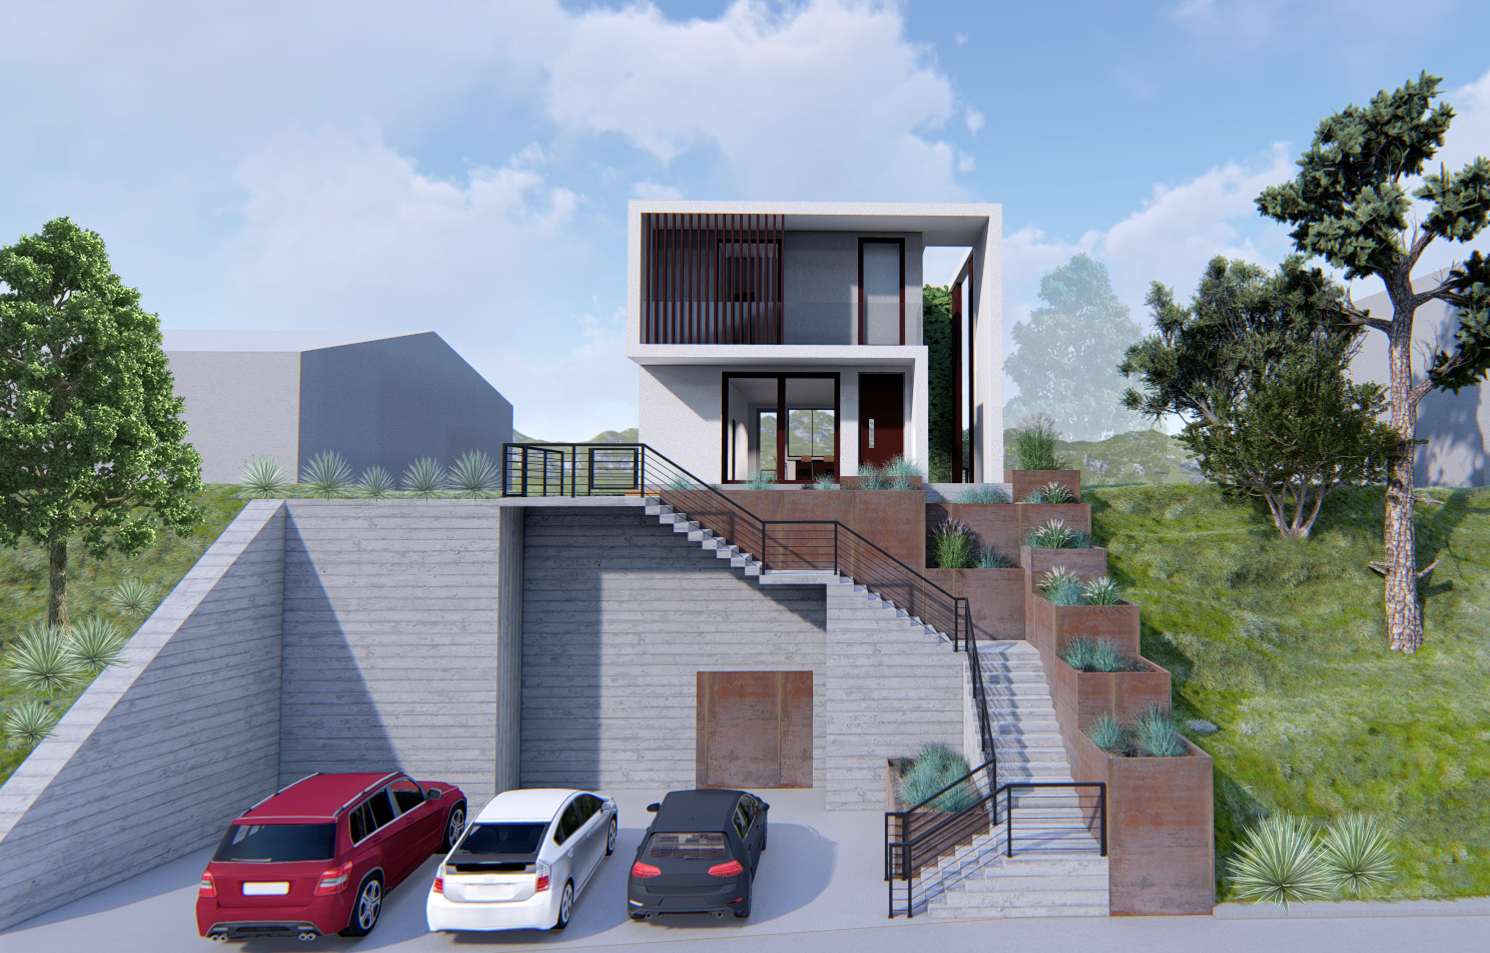 house render hillside cars grass concrete